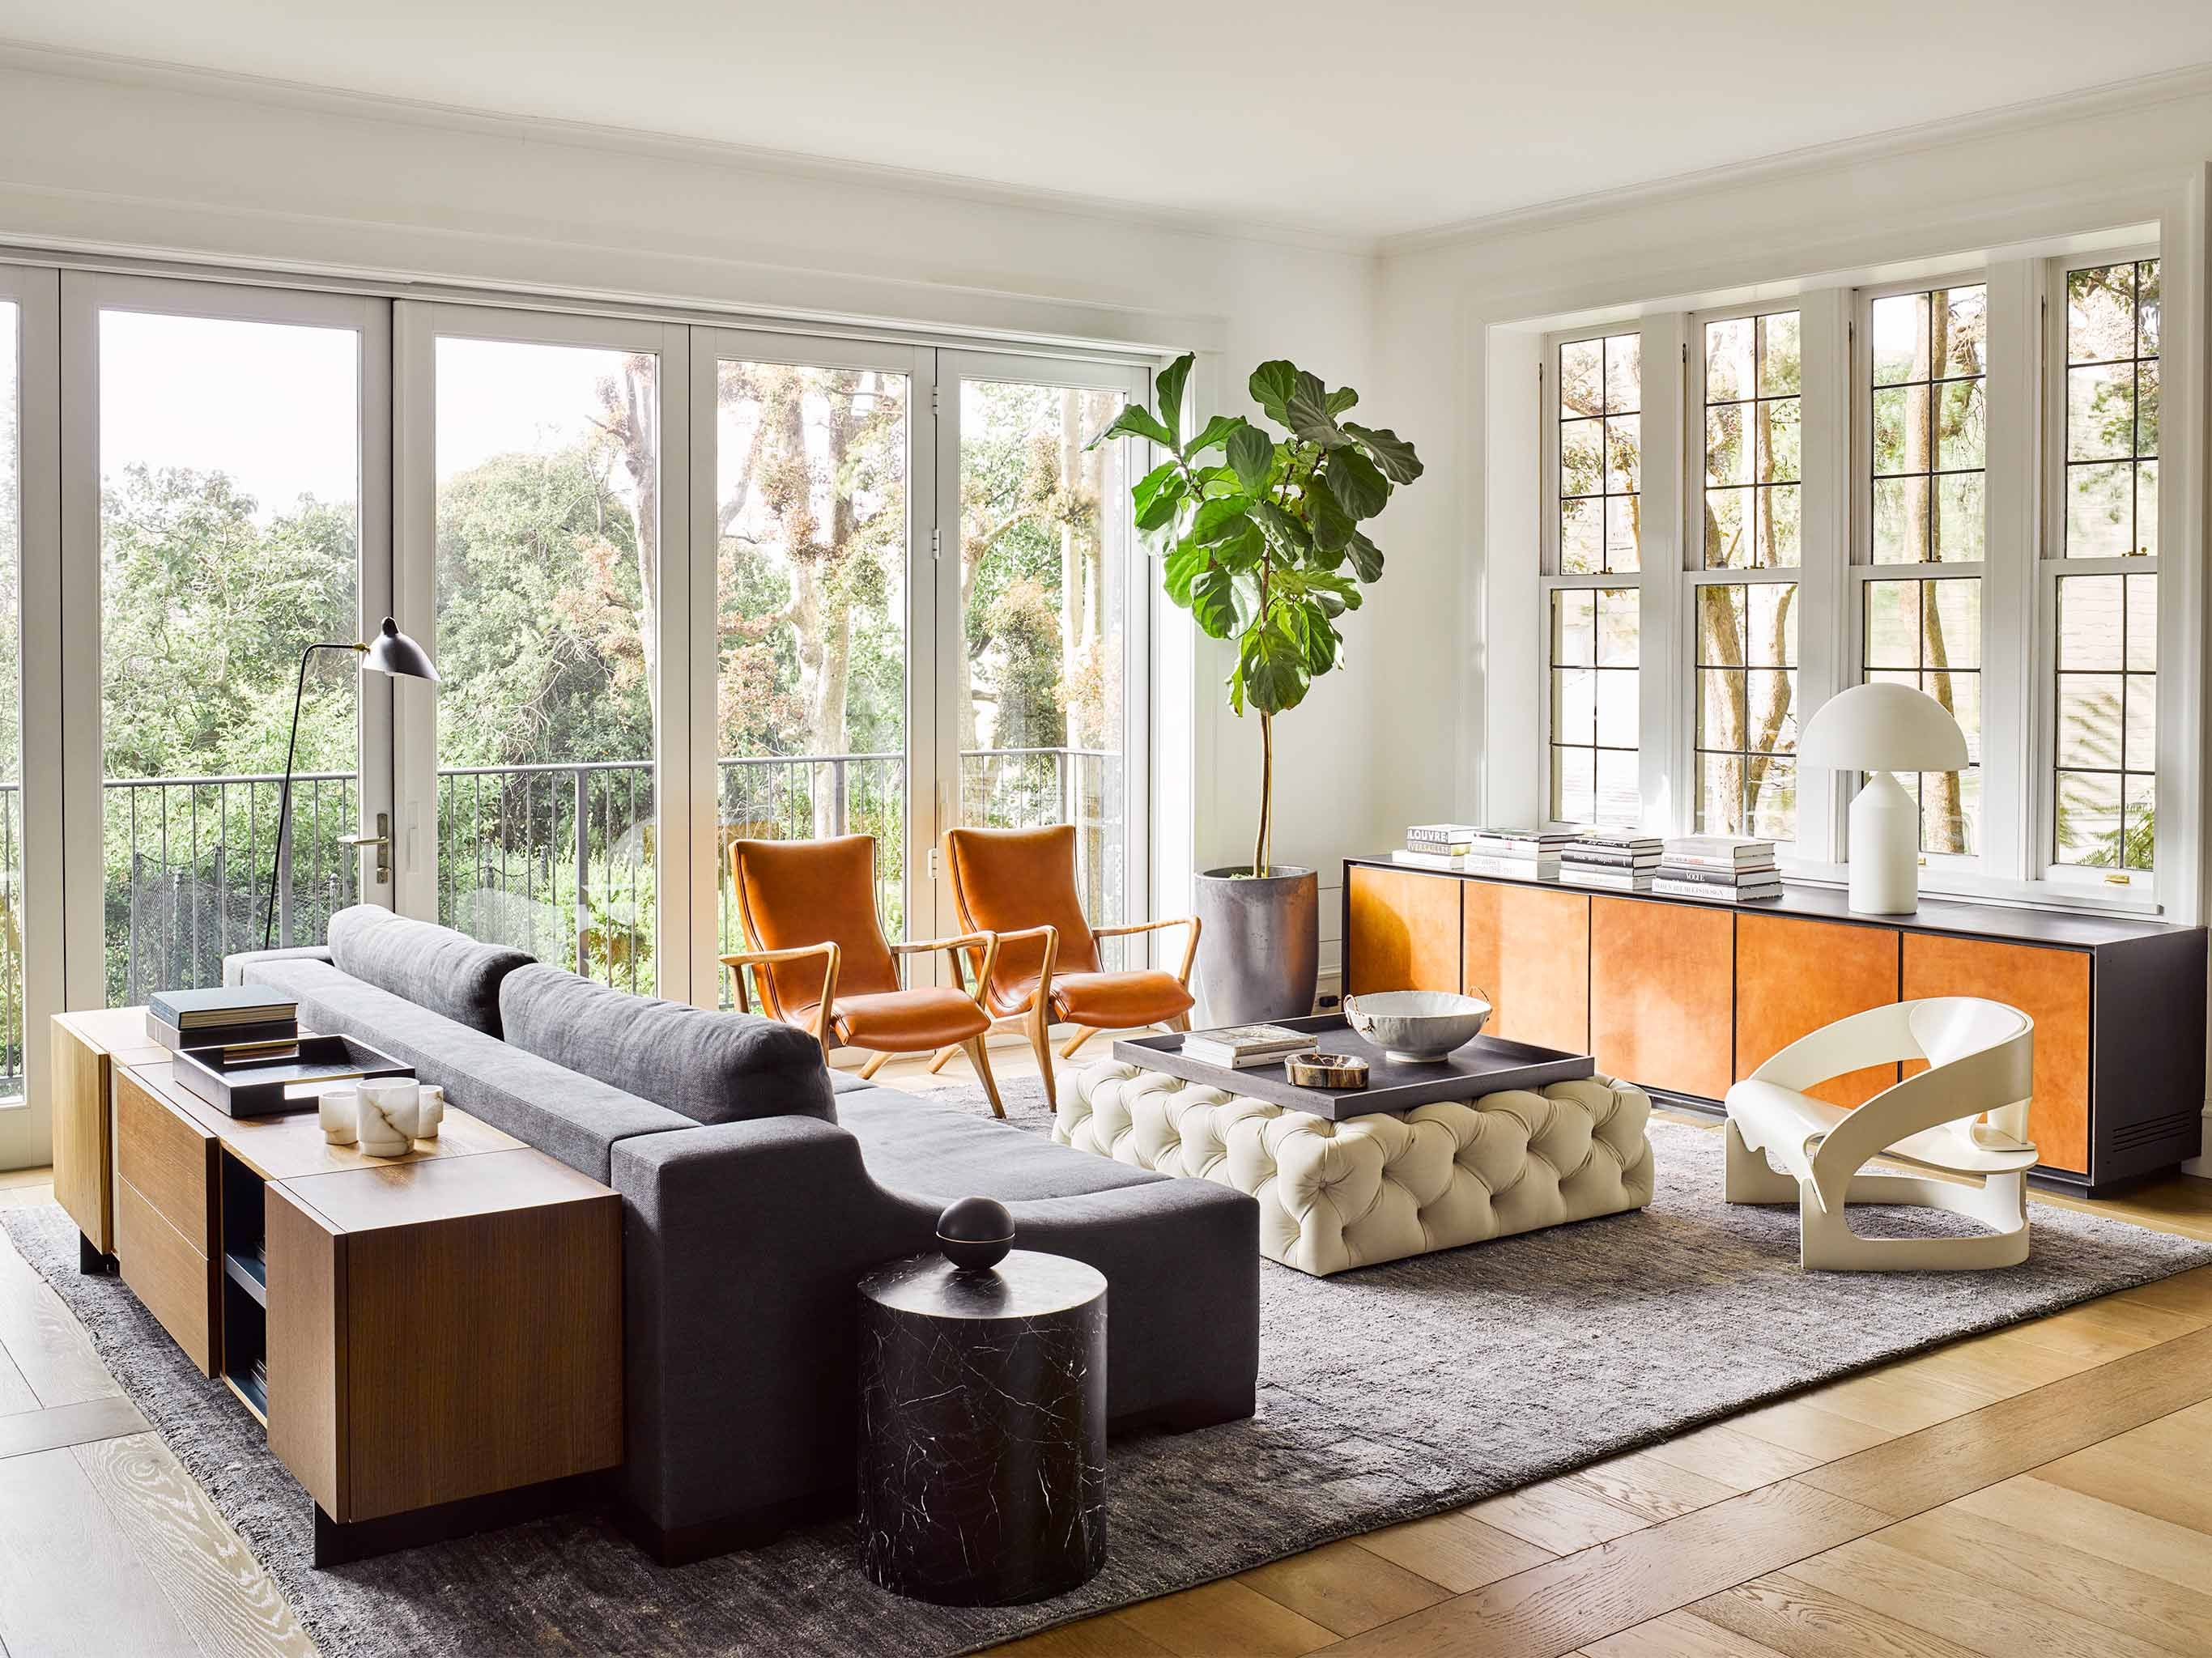 Top Project By Nicolehollis Interior Design Home Interior Design Projects